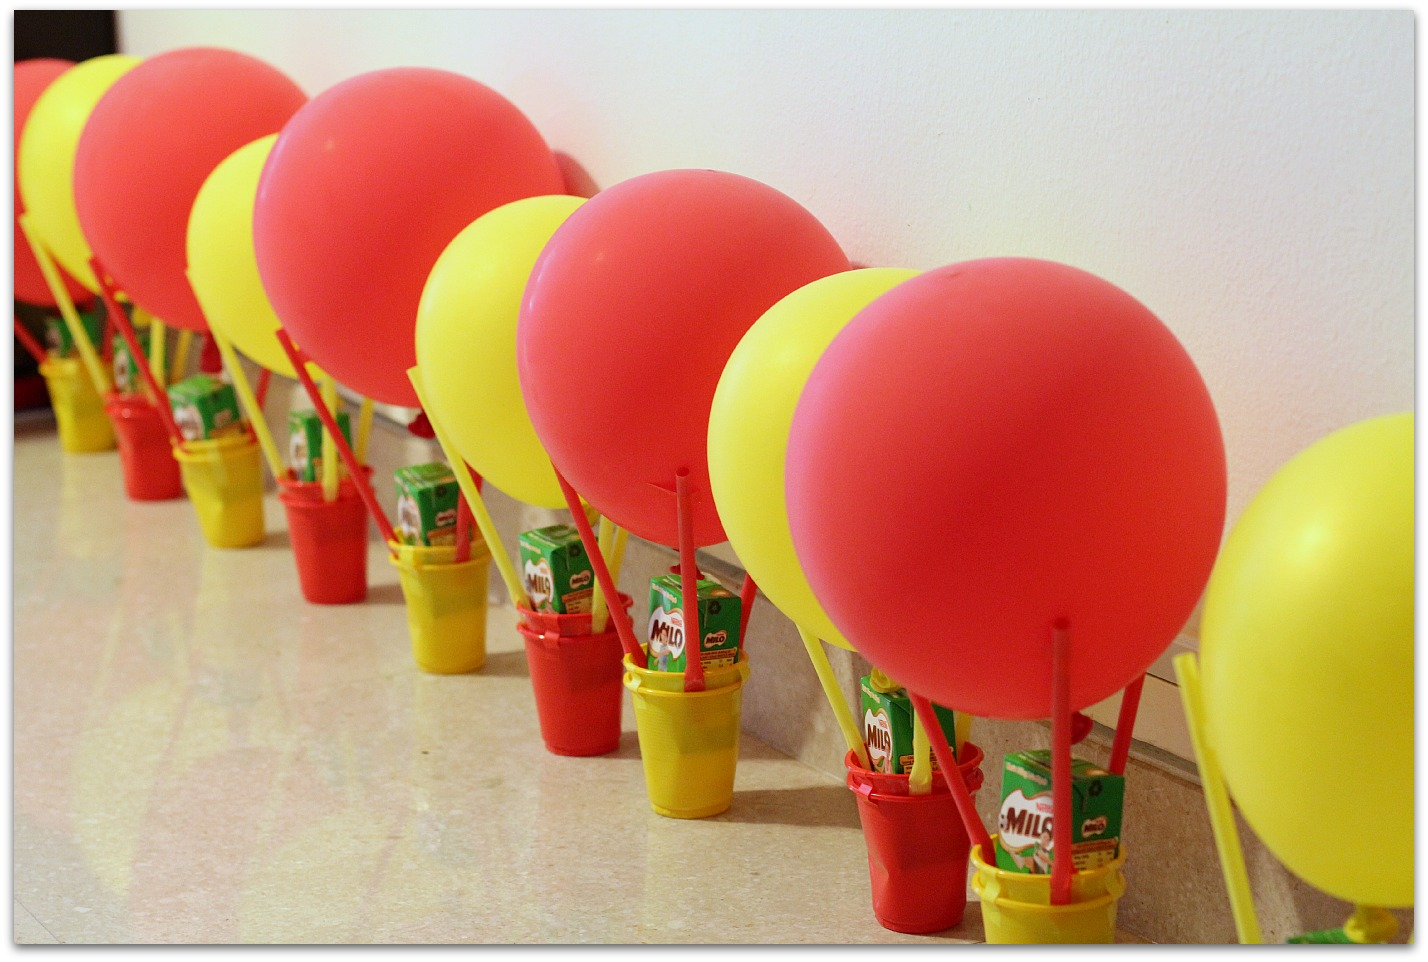 a dollop of me family food healthy living life s tidbits the rh adollopofme com party balloons for sale in phoenix az party balloons for sale in phoenix az